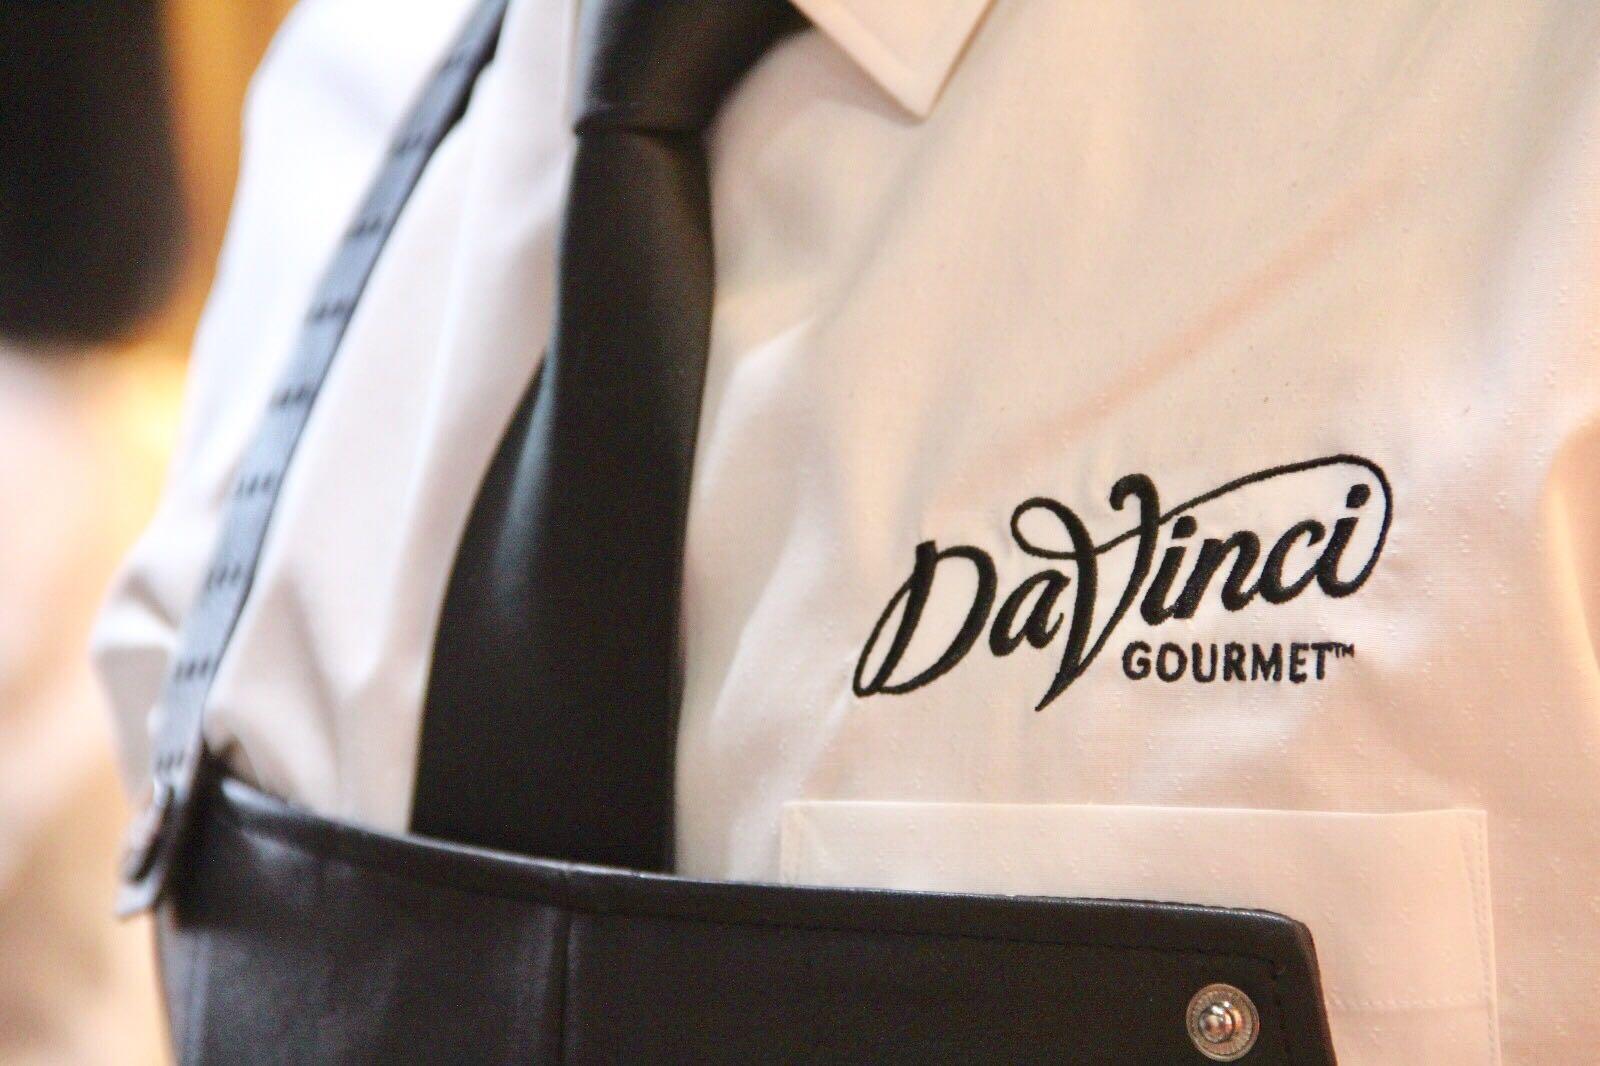 Da Vinci Gourmet Embroidery